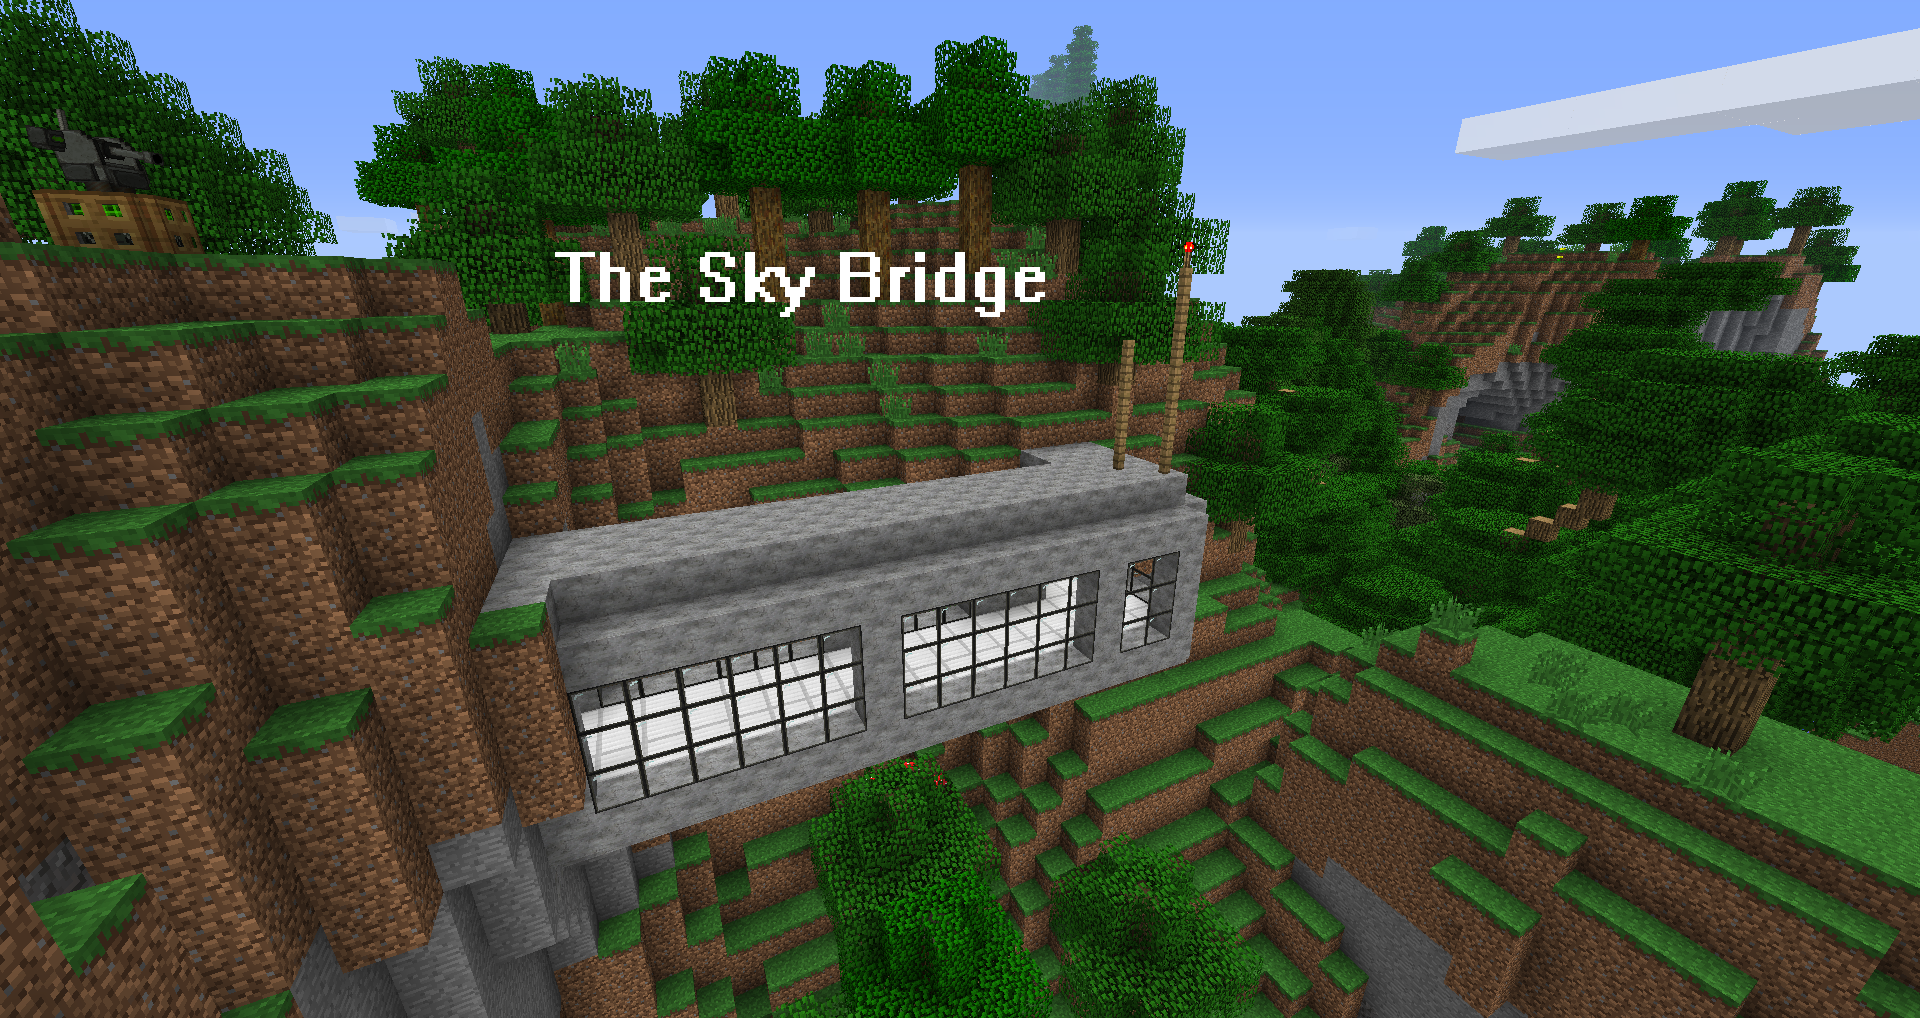 terrantechnocrat nrf minecraft facility the sky bridge by terrantechnocrat - Minecraft Japanese Bridge